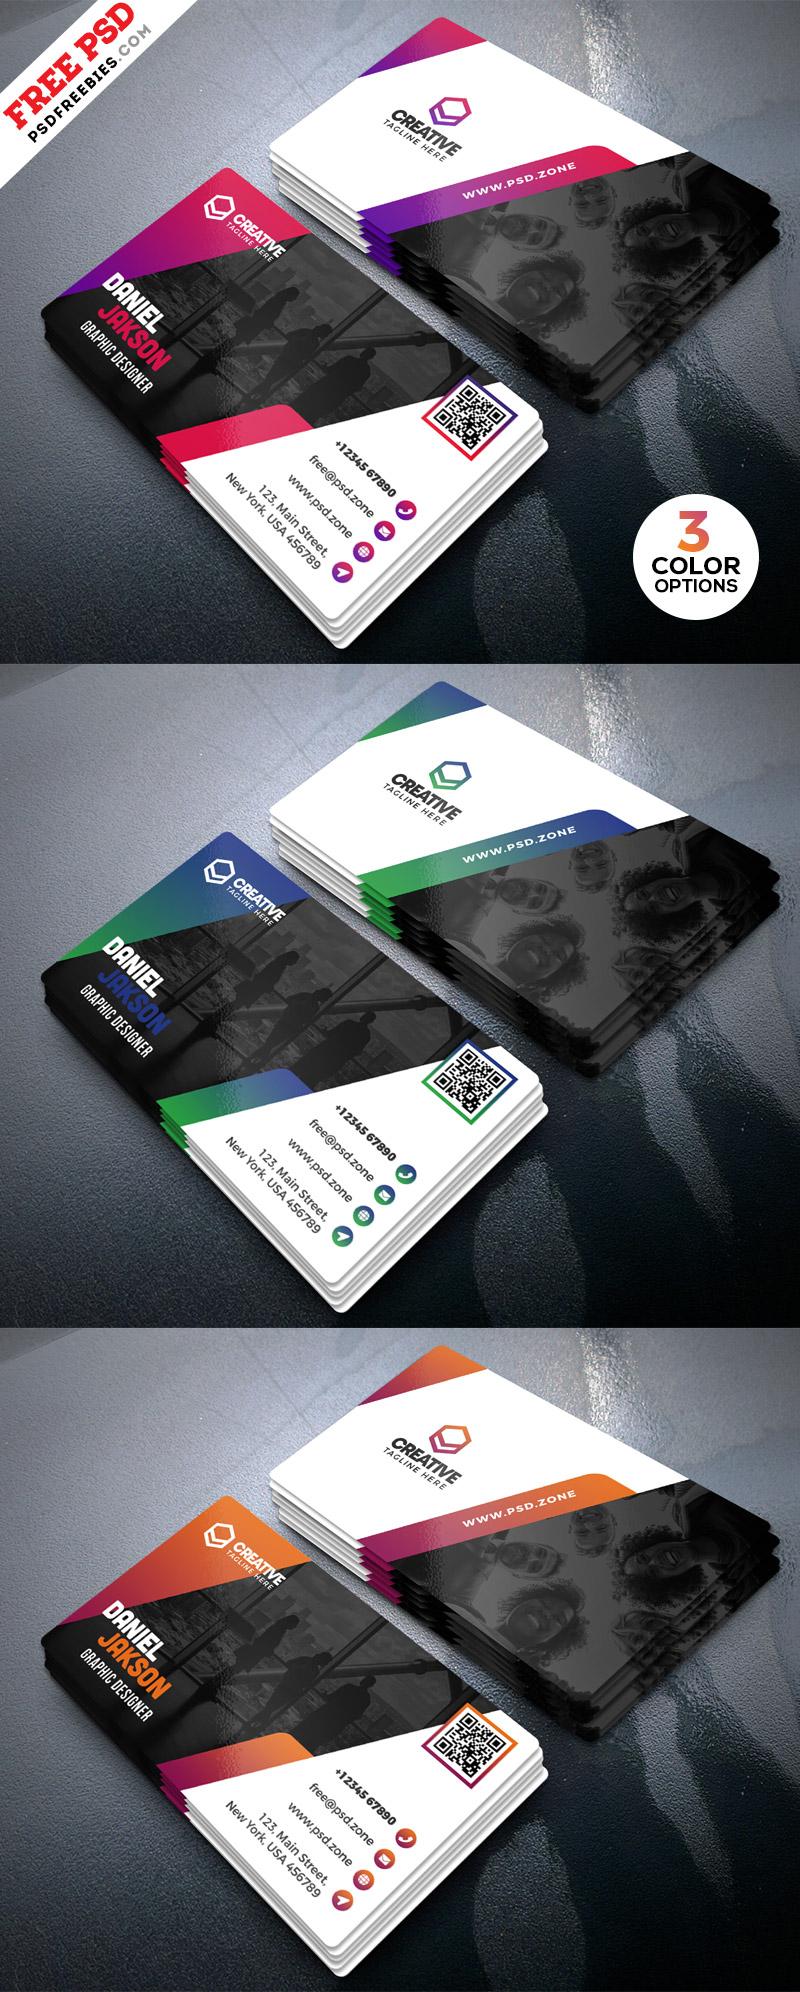 PSD Business Card Design Template